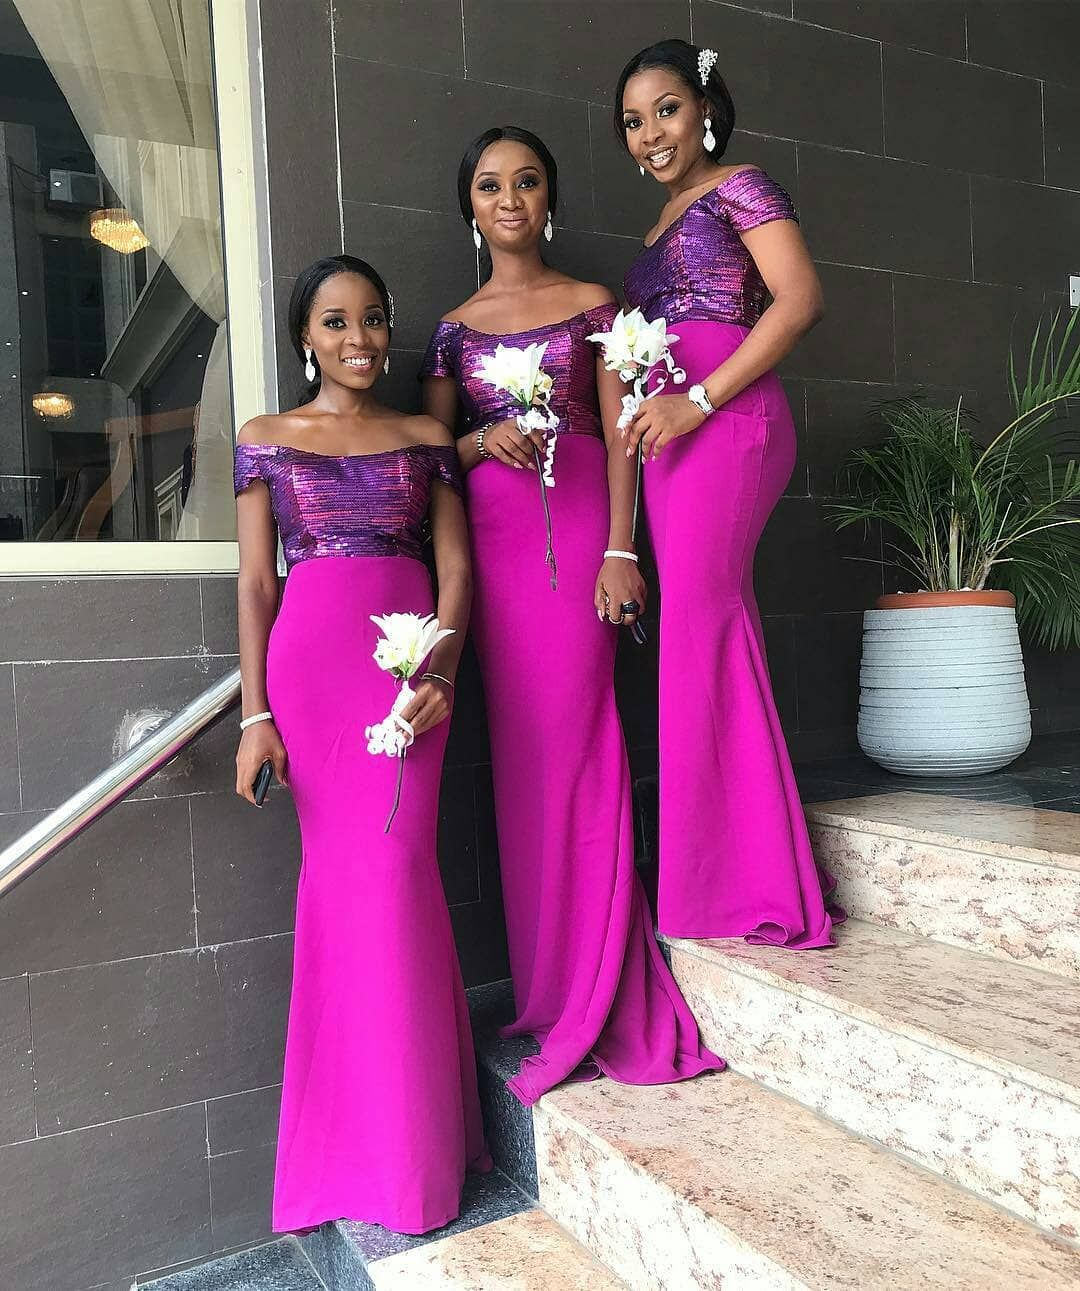 2af50a0e1fb Brides maids fot  oba17 Photo  perkymakeovers  ebweddings African  Bridesmaid Dresses